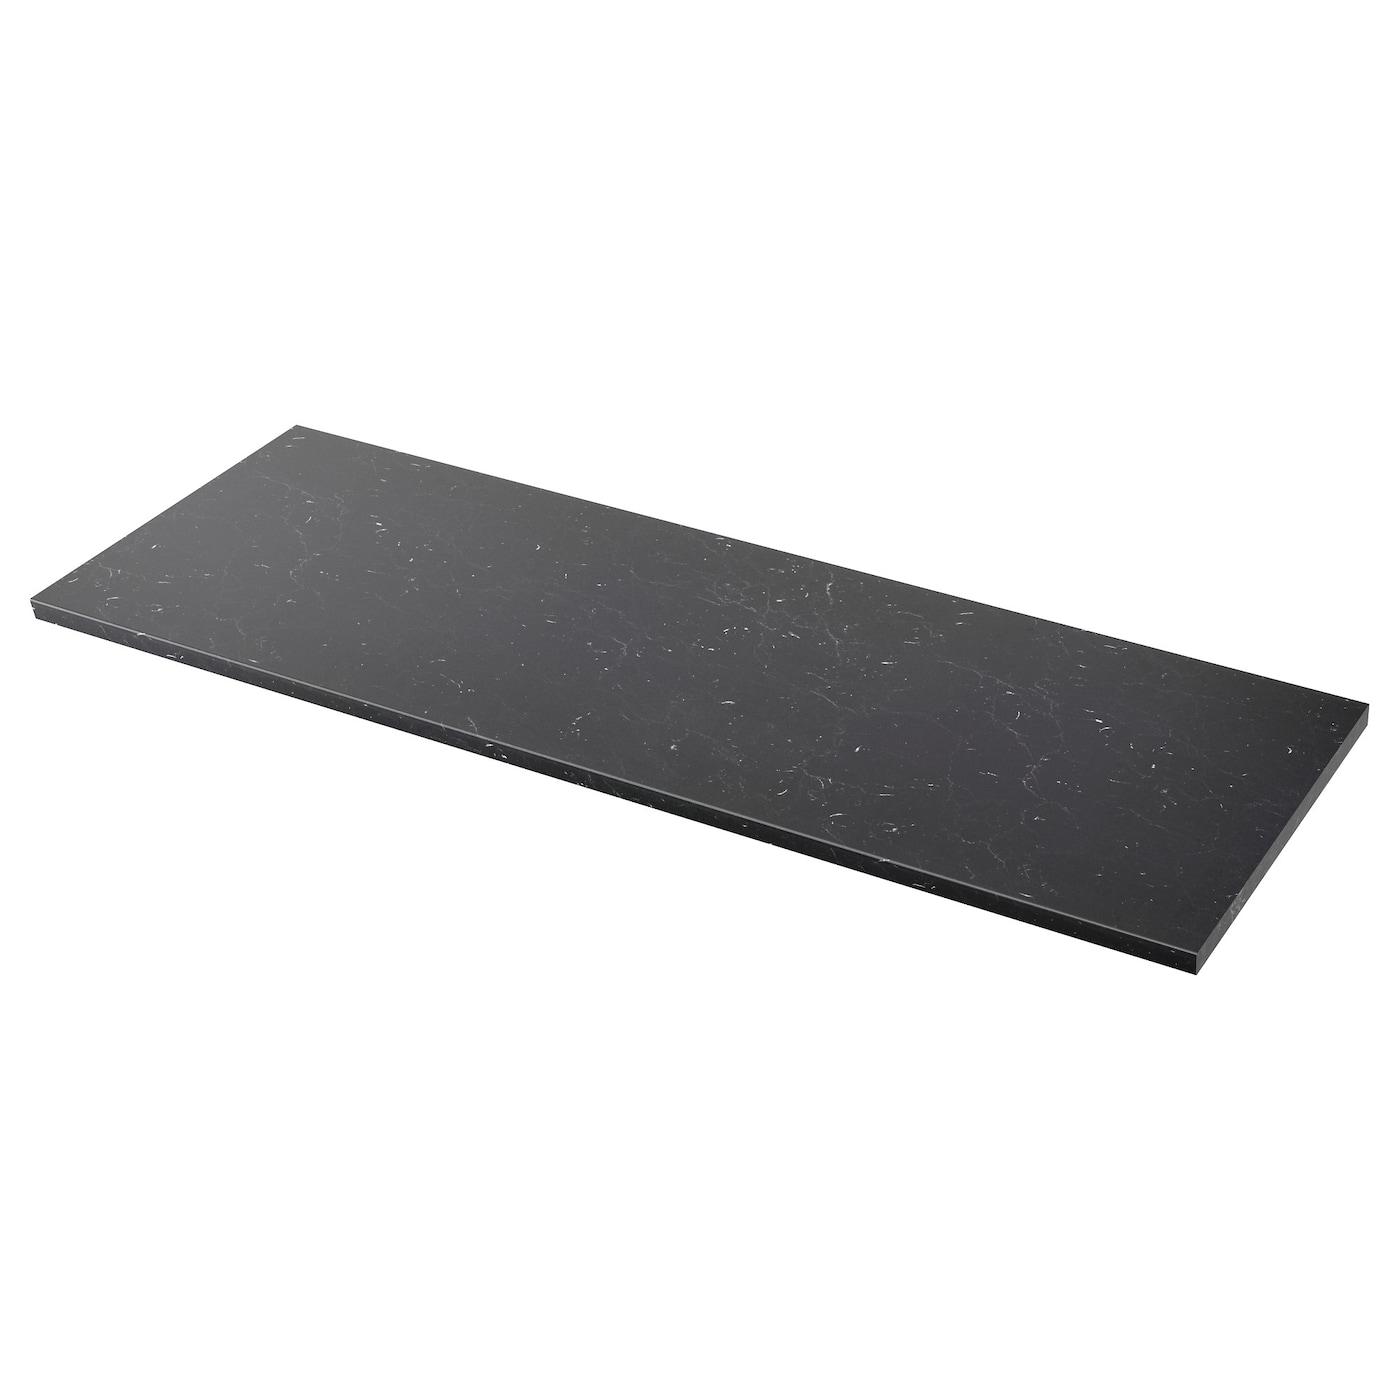 plaque de cuisine Ikea säljan plan de travail en blanc; 186x3,8cm